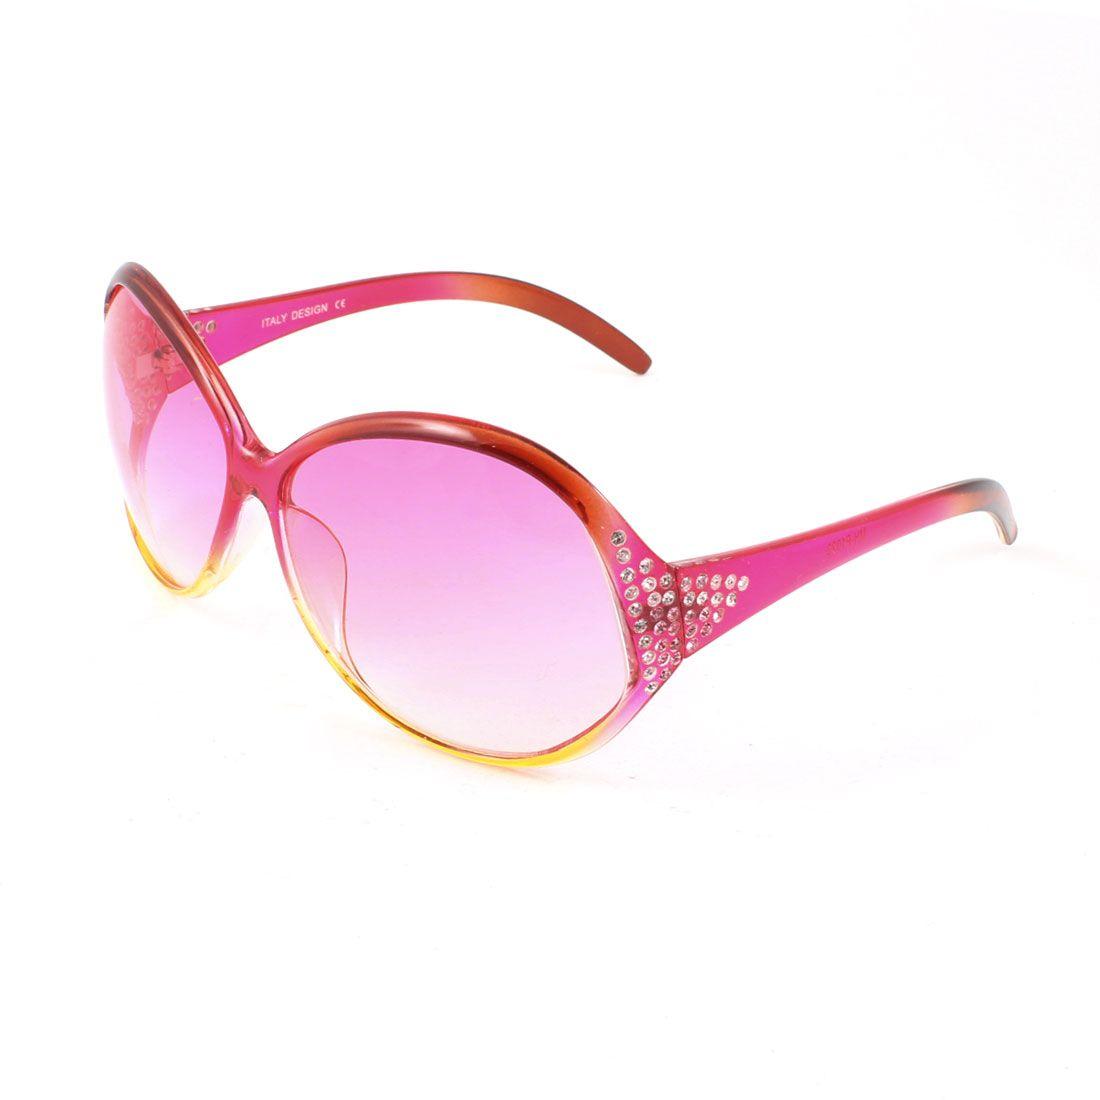 Glasses Frames With Rhinestones ... Faux Rhinestone ...